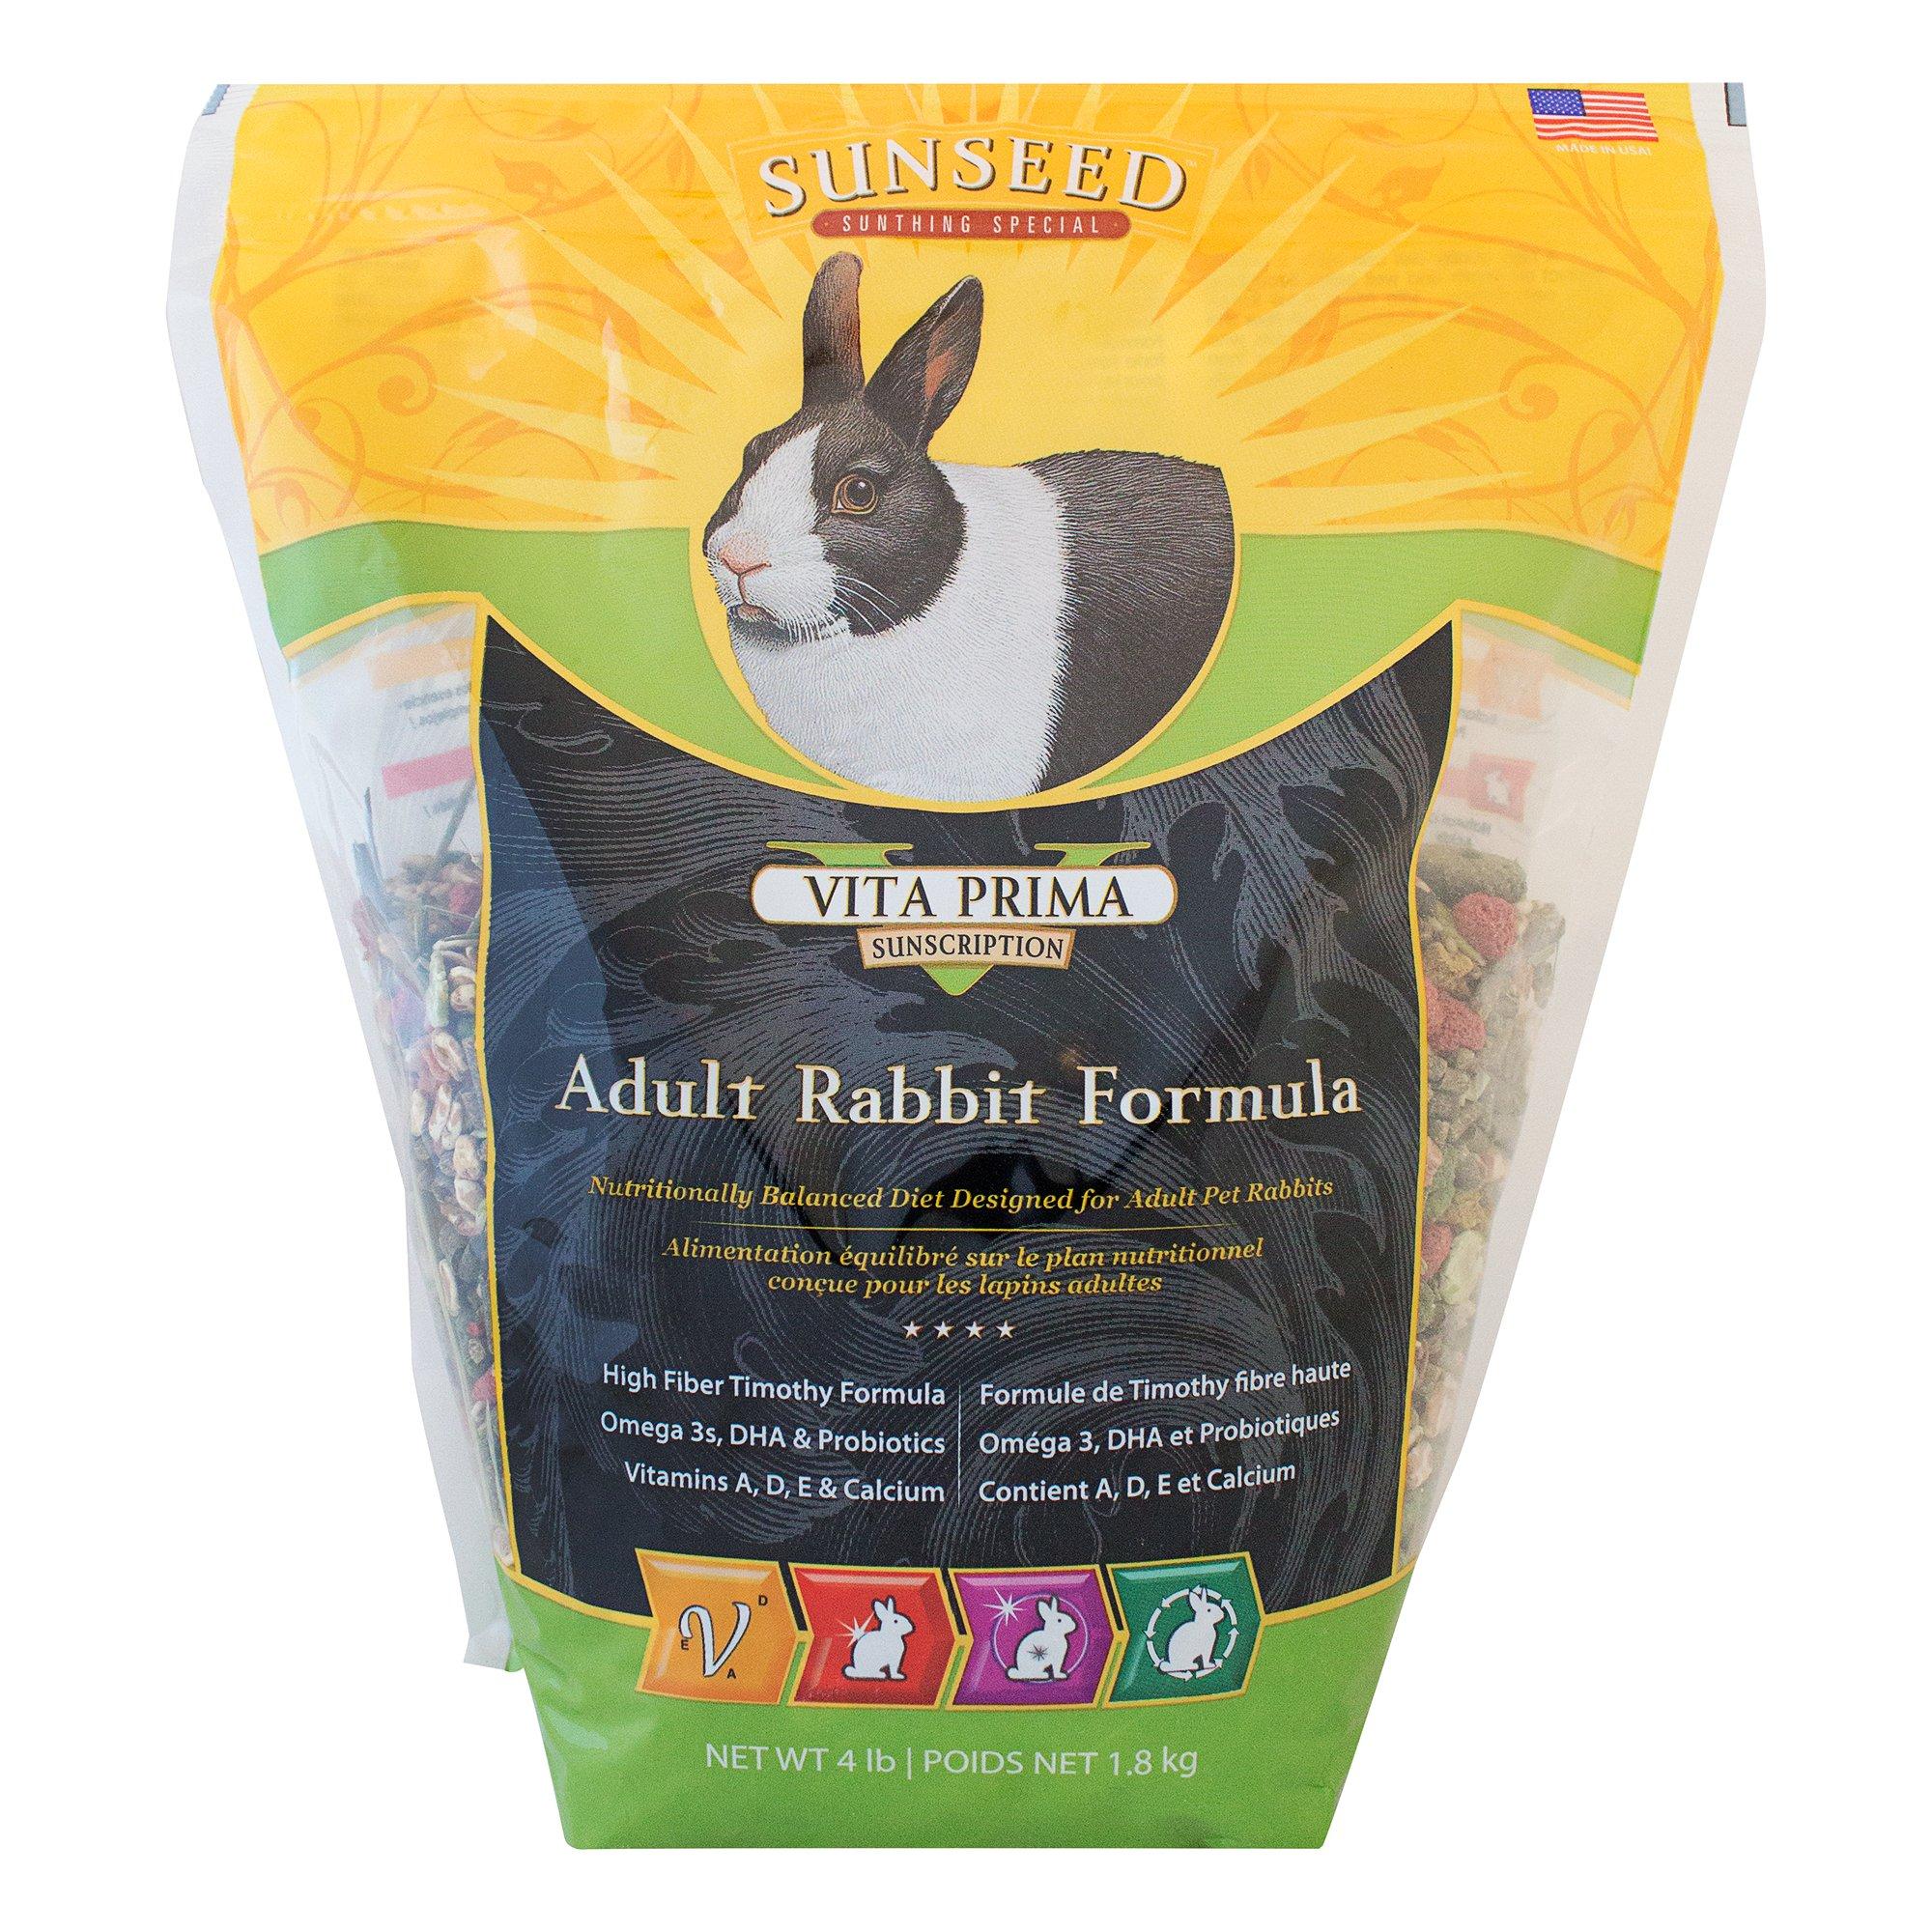 Sun Seed Sunscription Vita Prima Adult Rabbit Formula